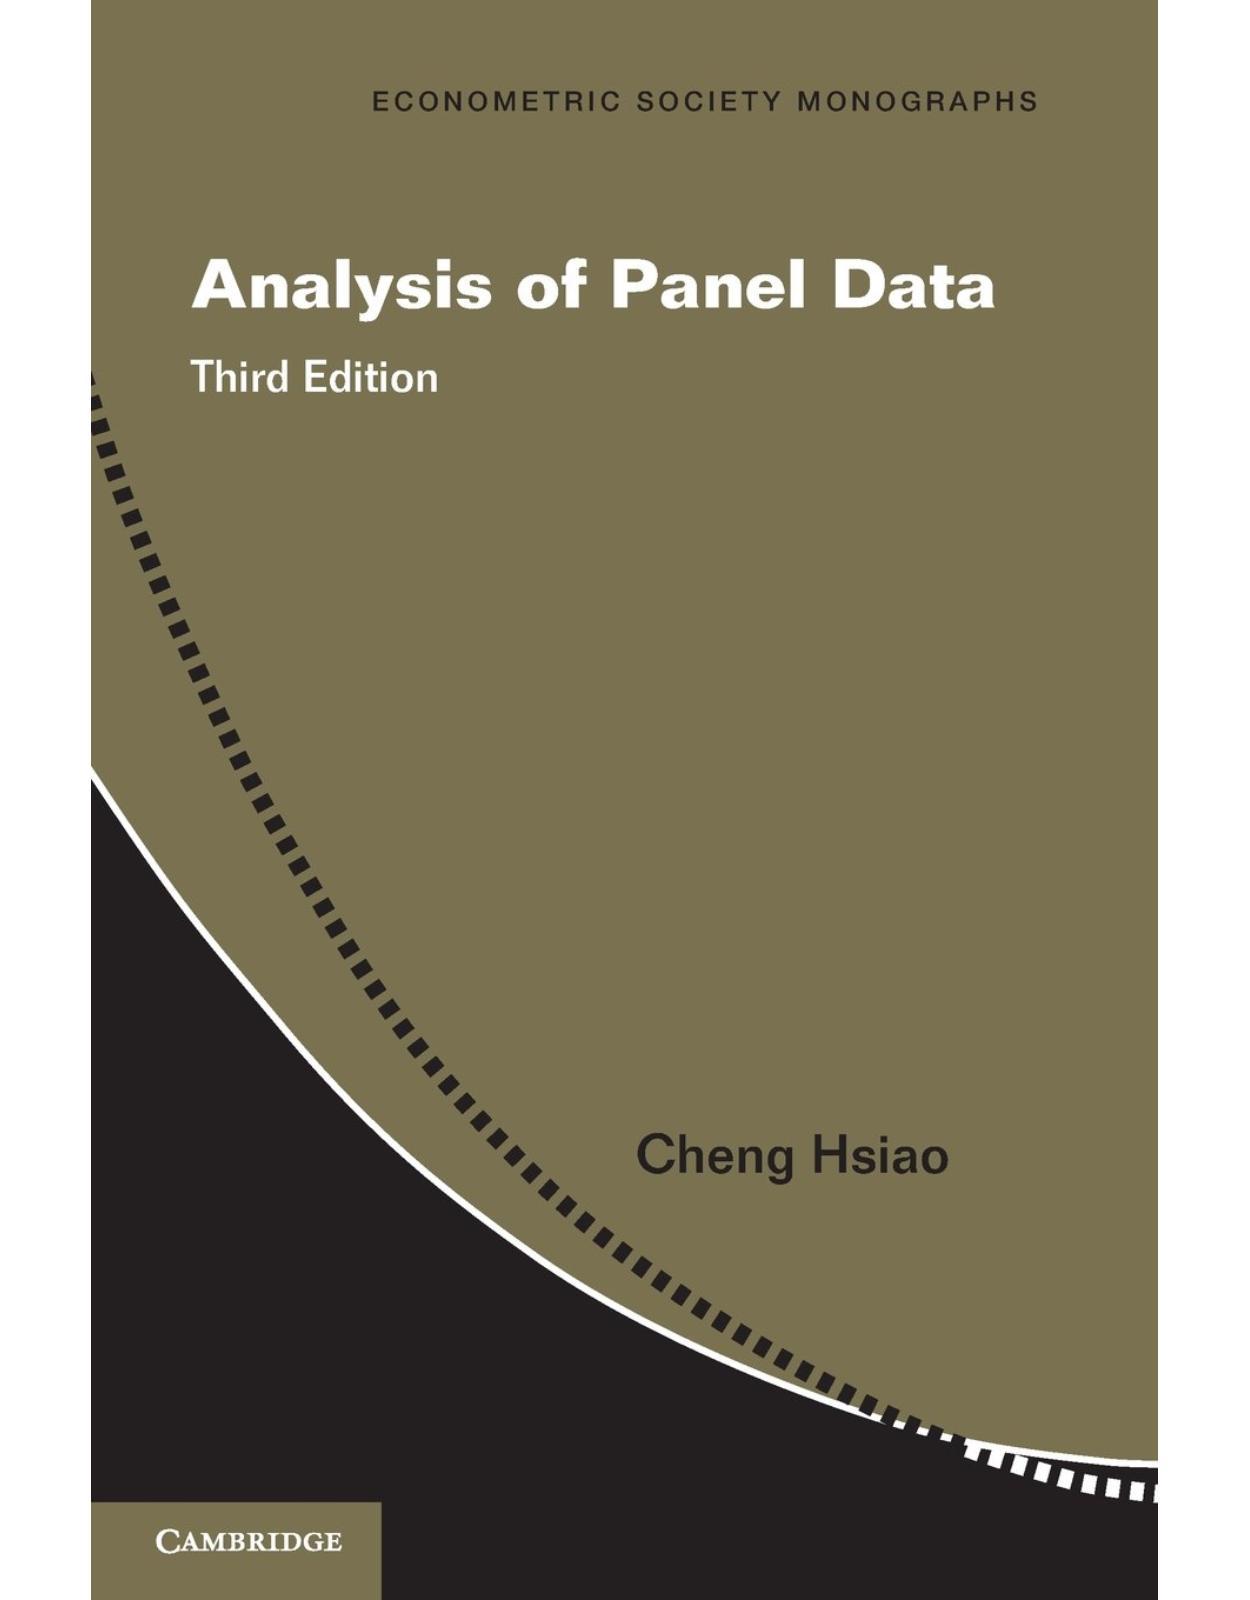 Analysis of Panel Data (Econometric Society Monographs)